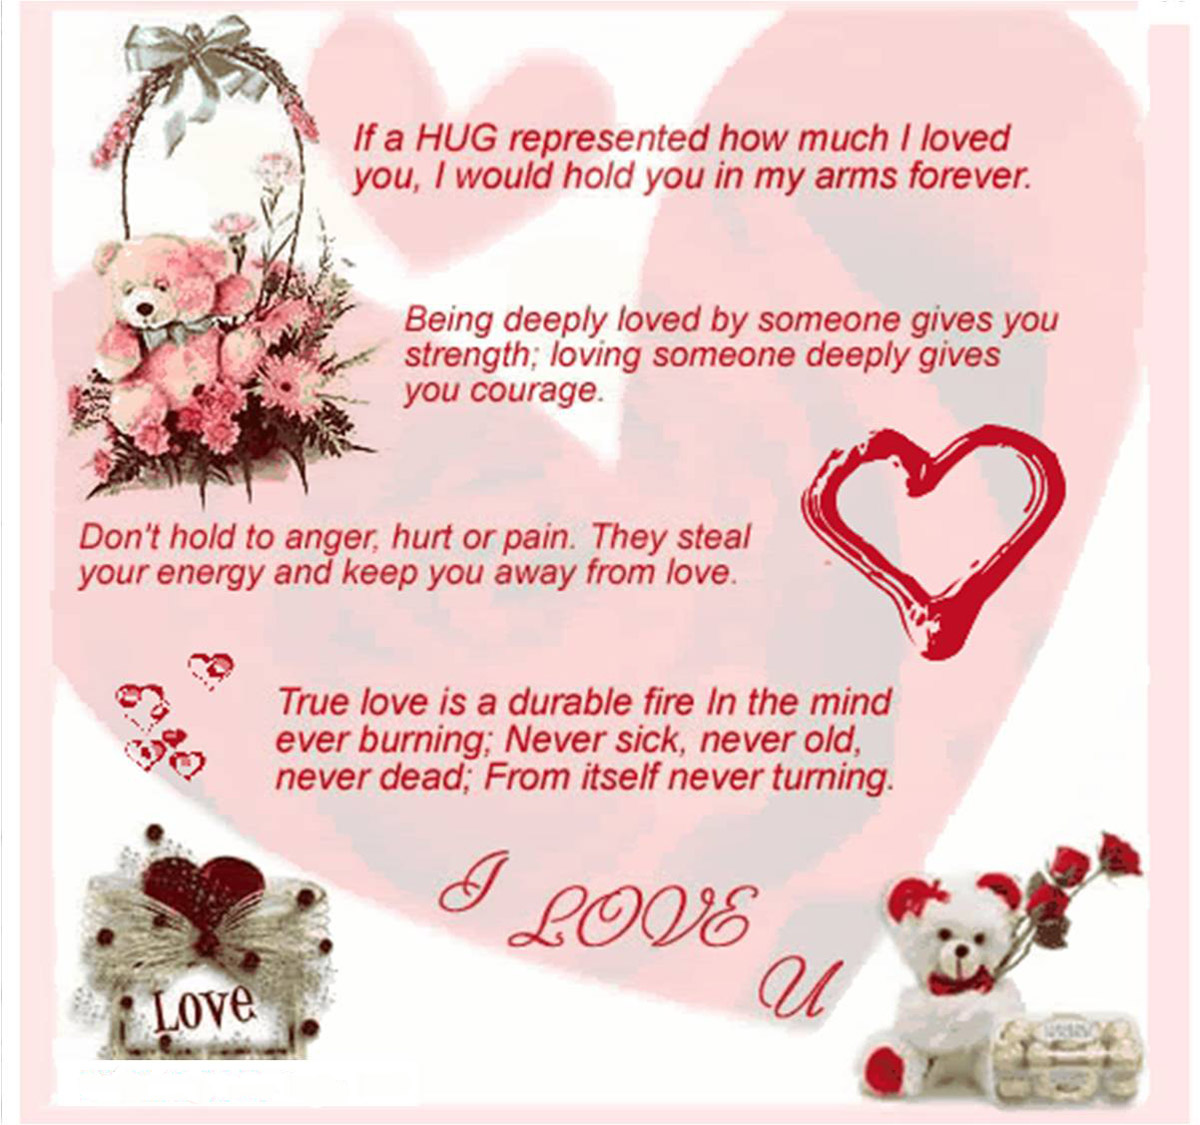 Love quotes 25